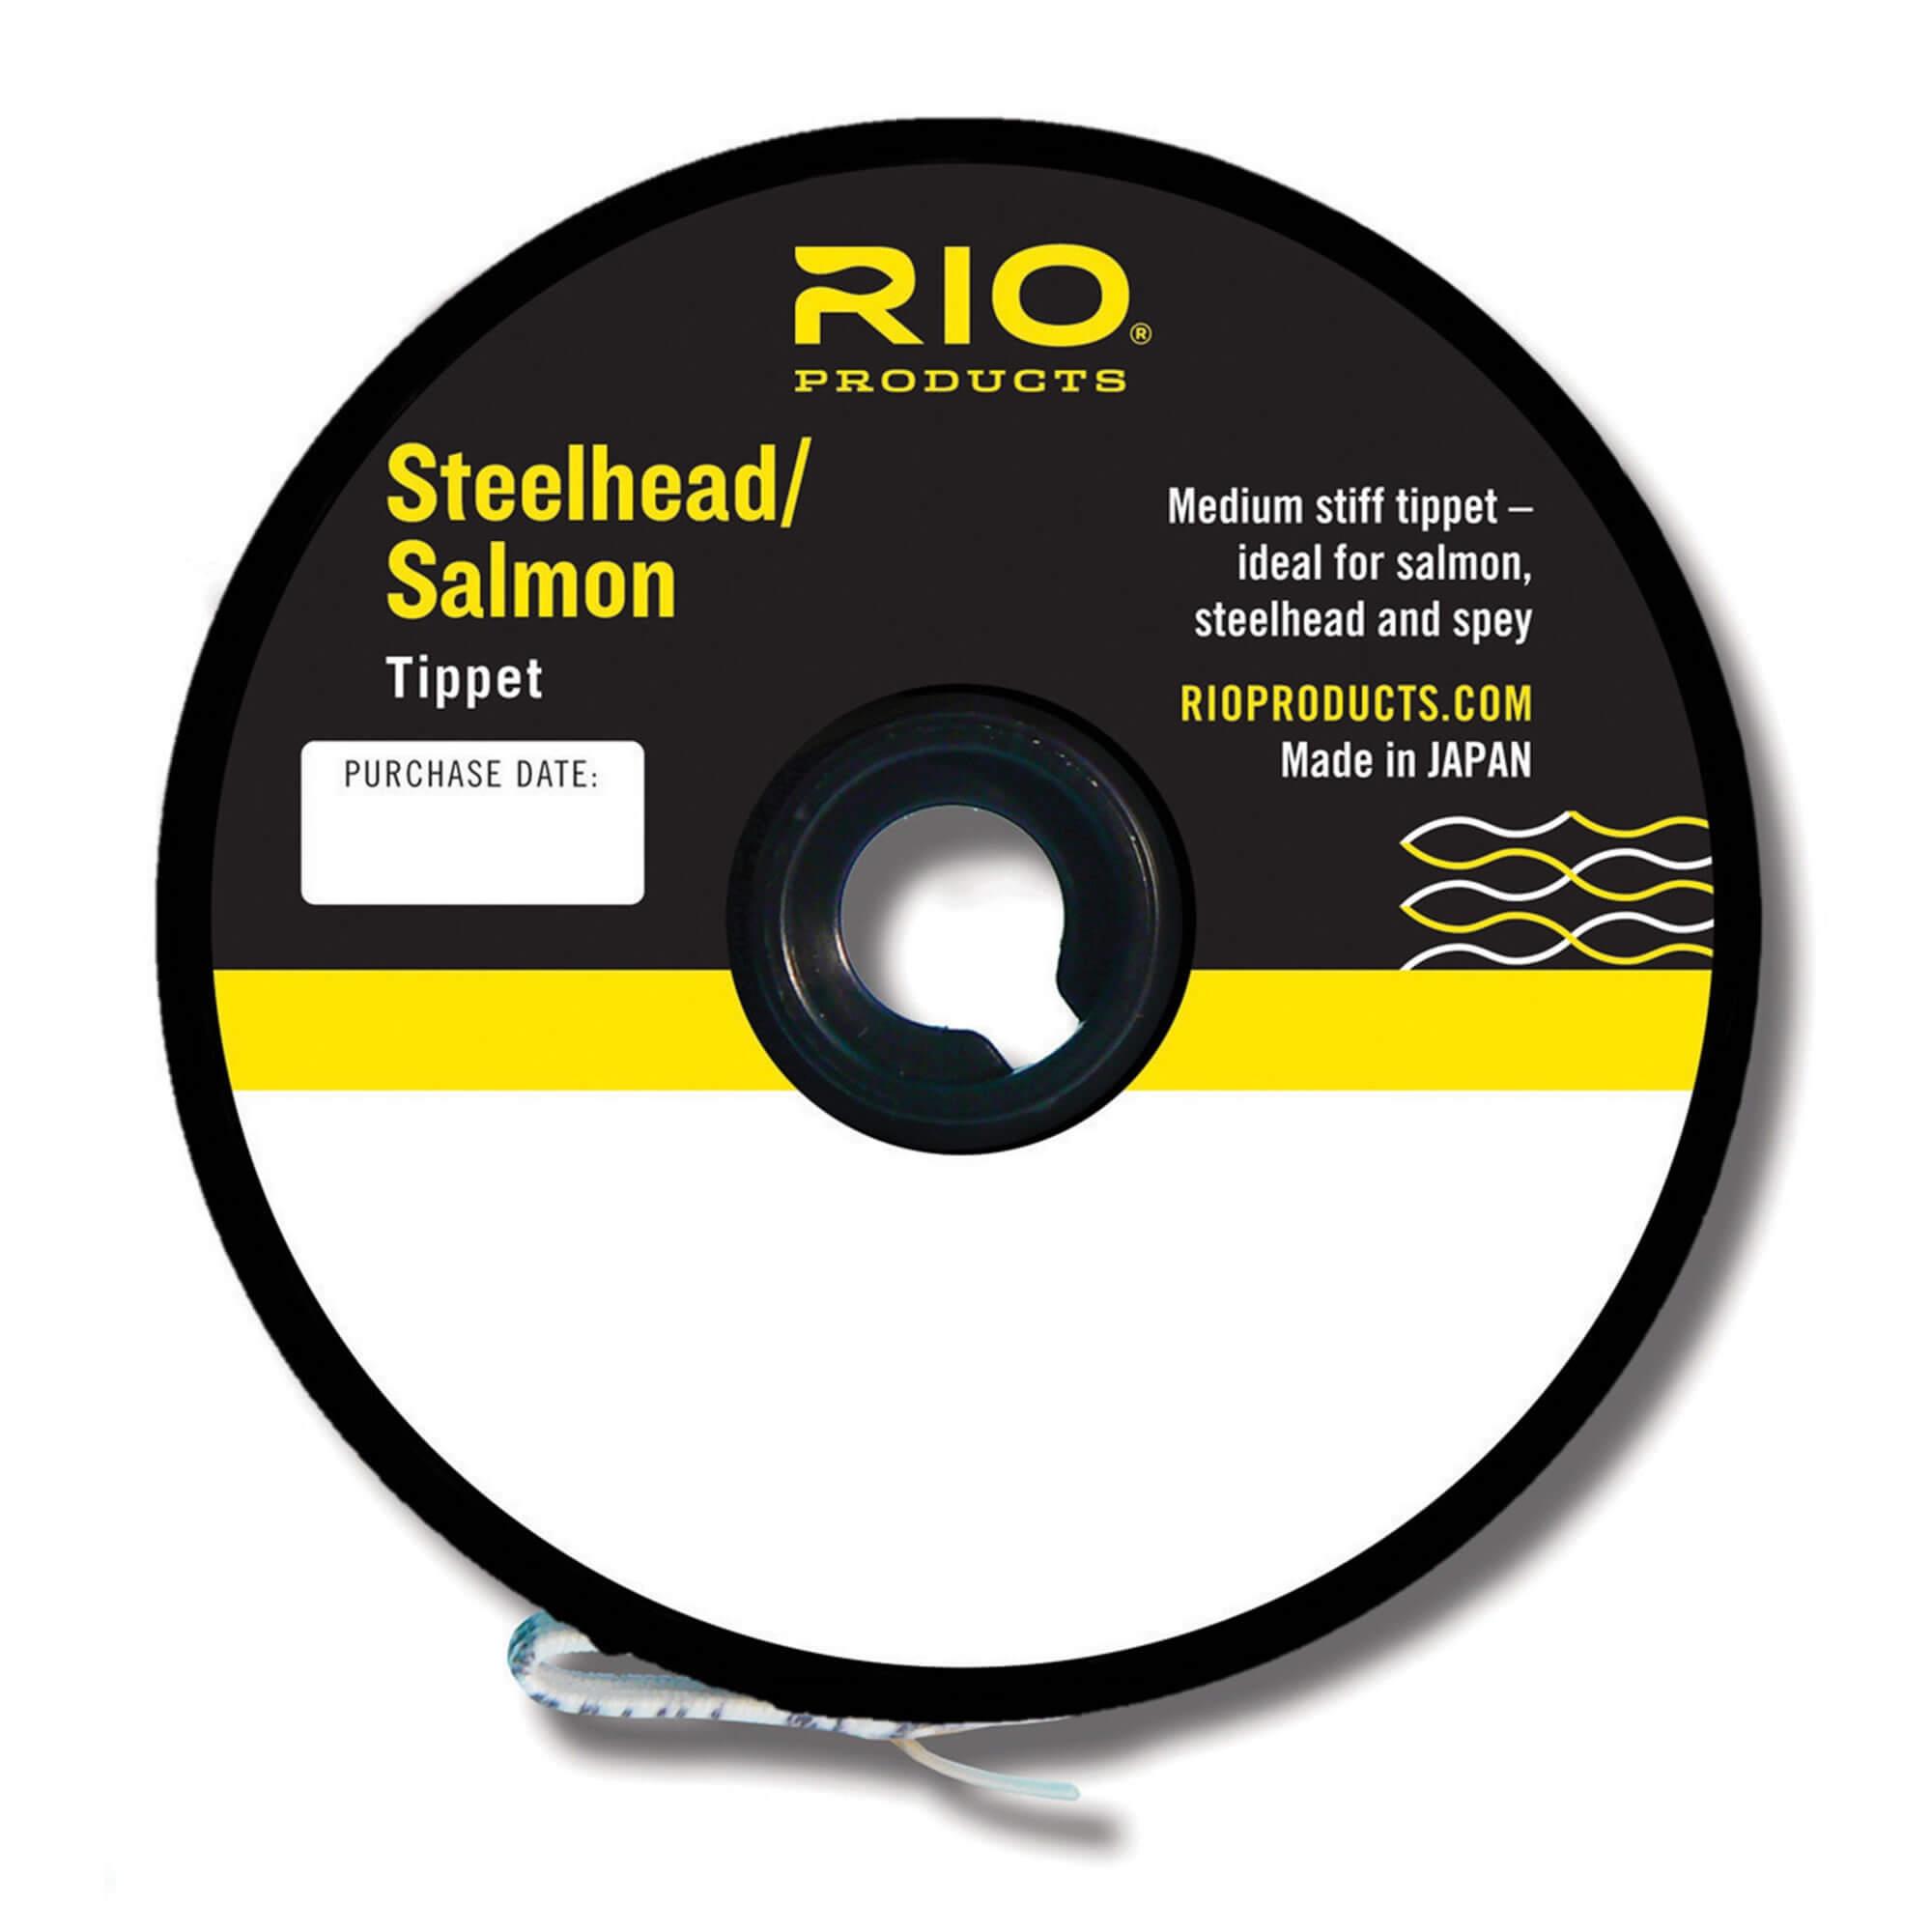 Freshwater Tippet Steelhead/Salmon